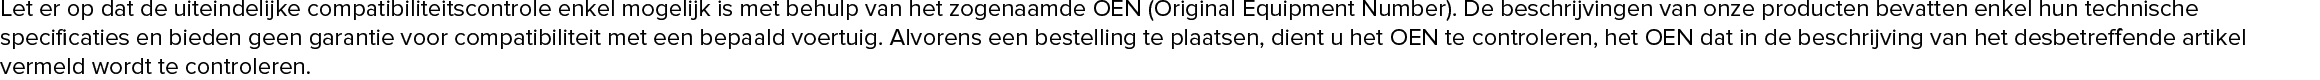 PURFLUX XD67, XD77, XD9037E, XD9038E, XD9043E Brandstoffilter